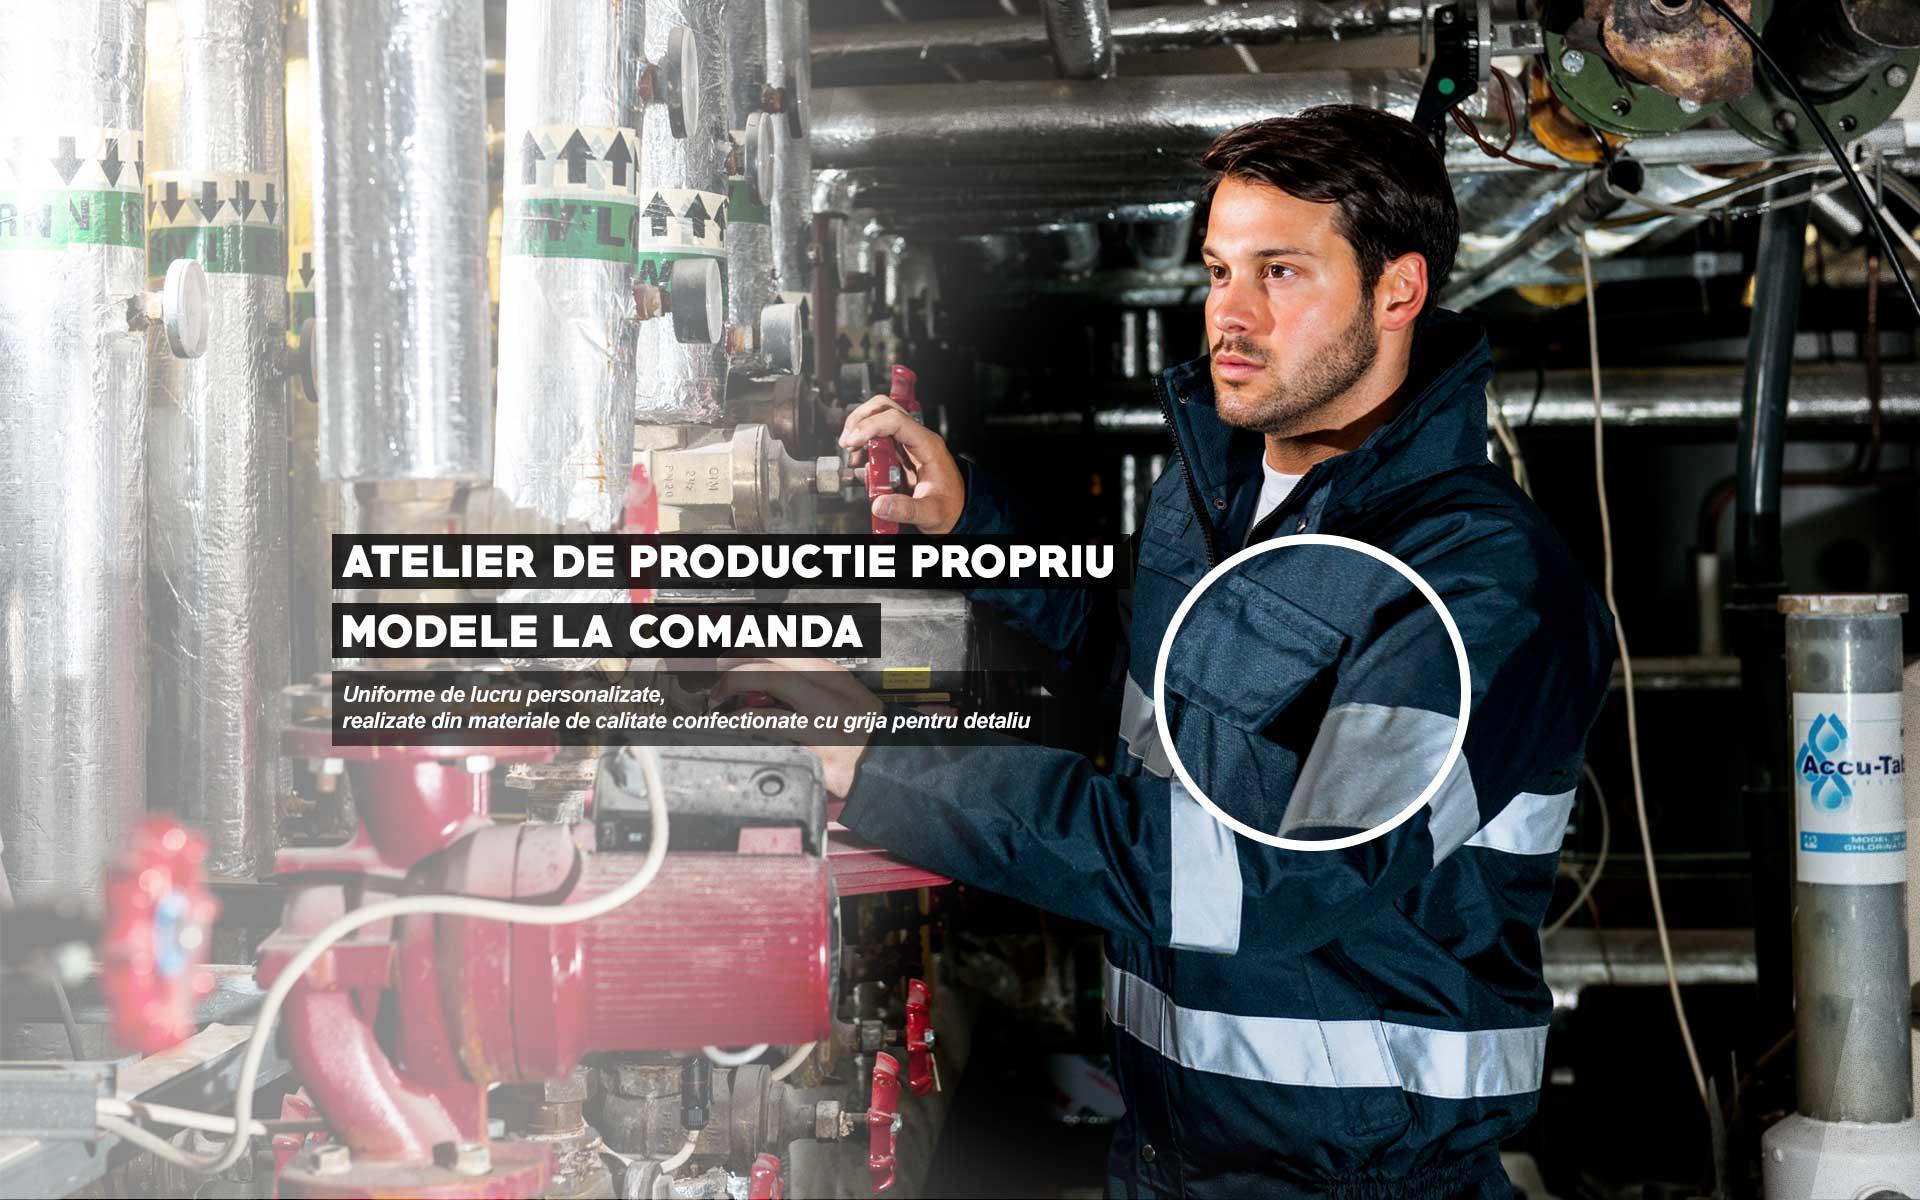 echipamente pentru protectia muncii online